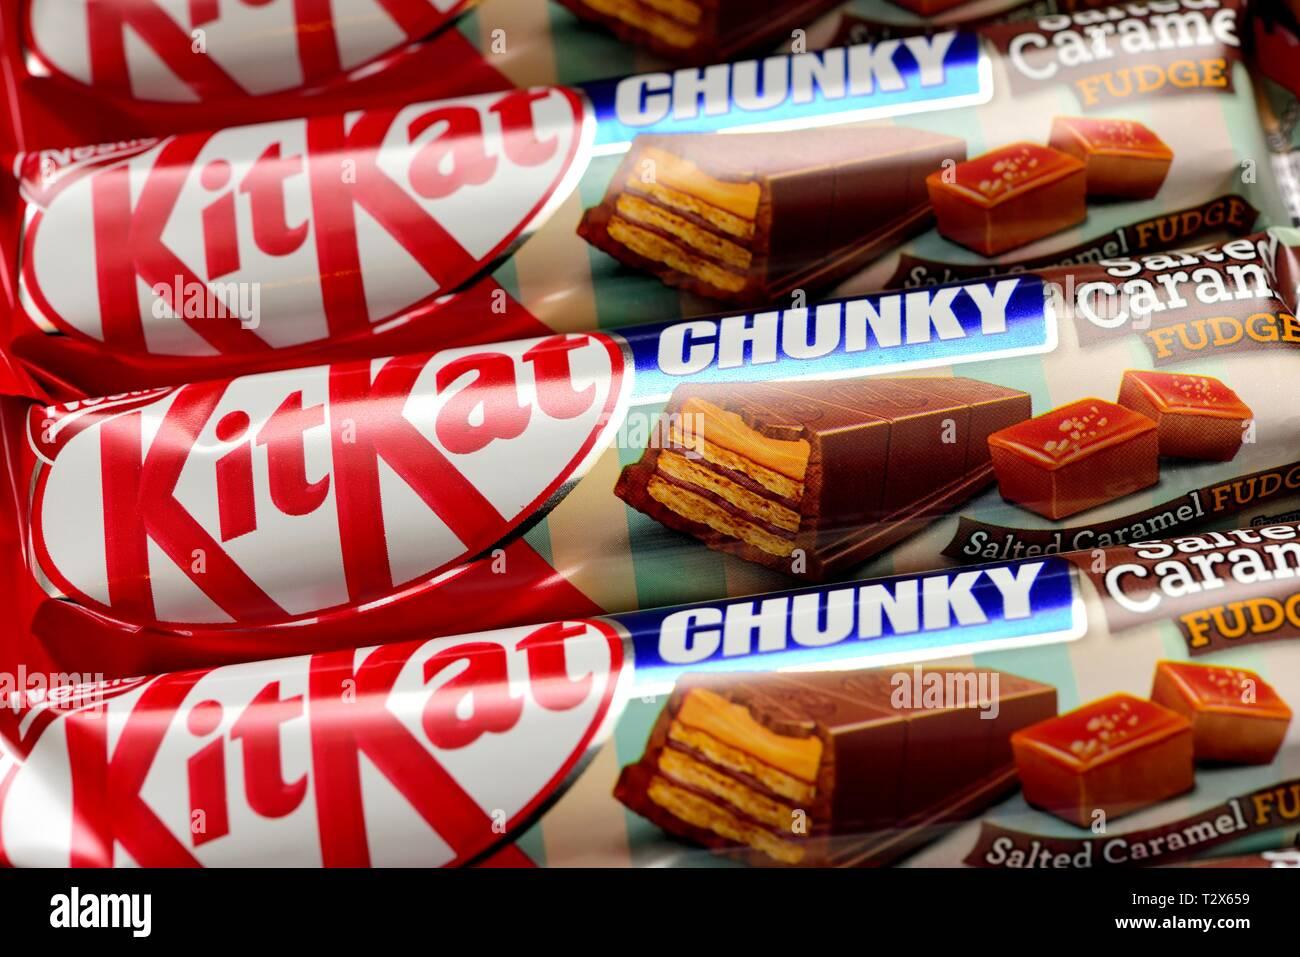 Kitkat Chunky,Salted Caramel fudge Stock Photo